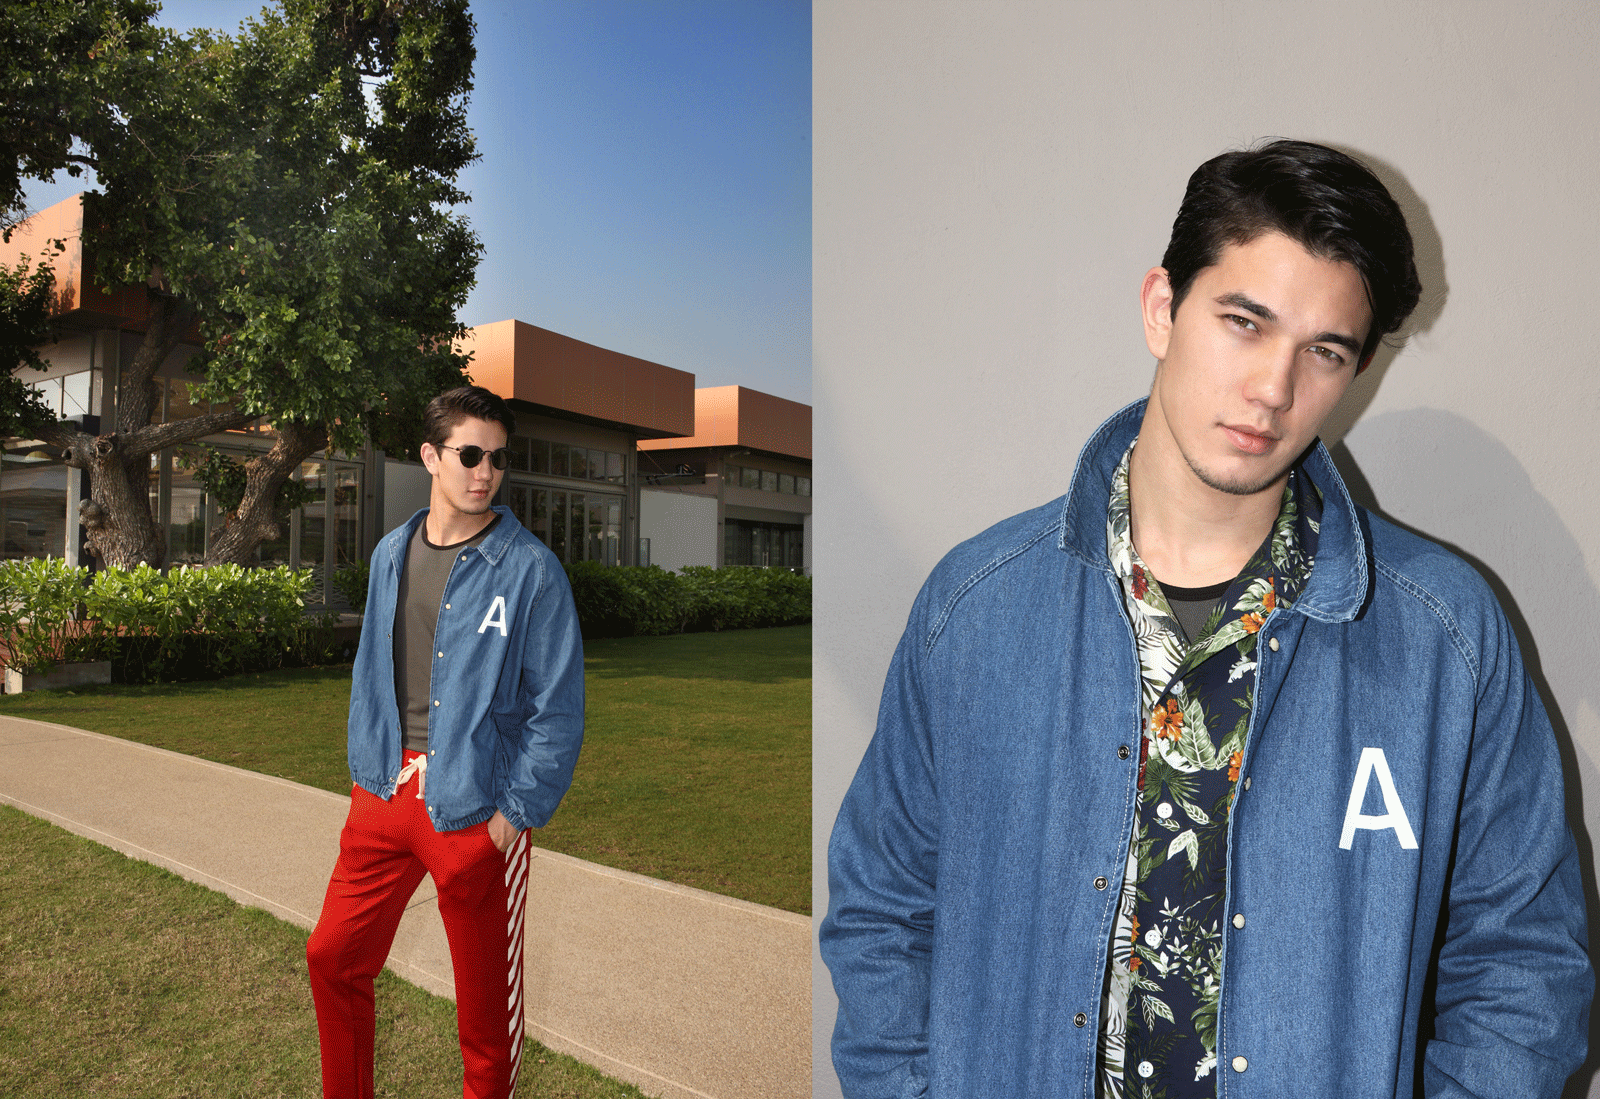 shirt : Leisure Projects / jacket and pants : CV_homme / tank top : NOXX / sunglasses : TAVAT